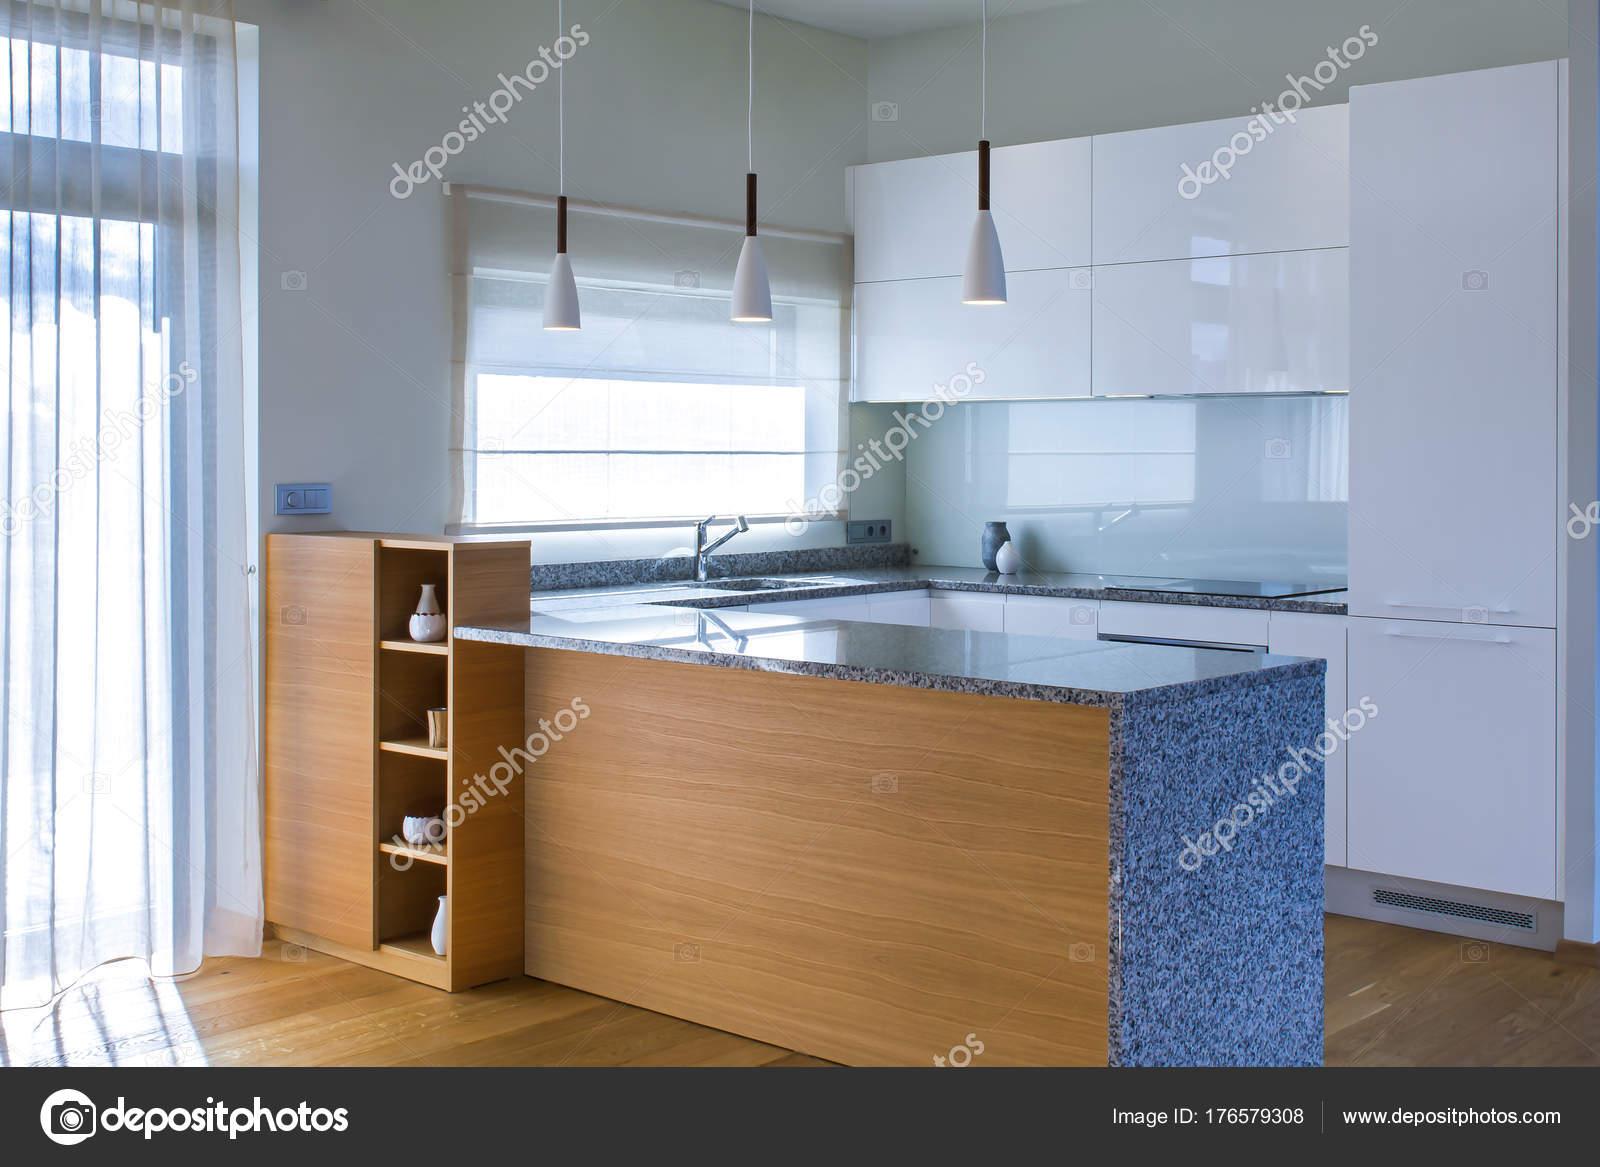 designing a kitchen bakers racks for kitchens 现代厨房设计在轻的内部与木口音房间里还有一个厨房半岛厨房和客厅结合 现代厨房设计在轻的内部与木口音房间里还有一个厨房